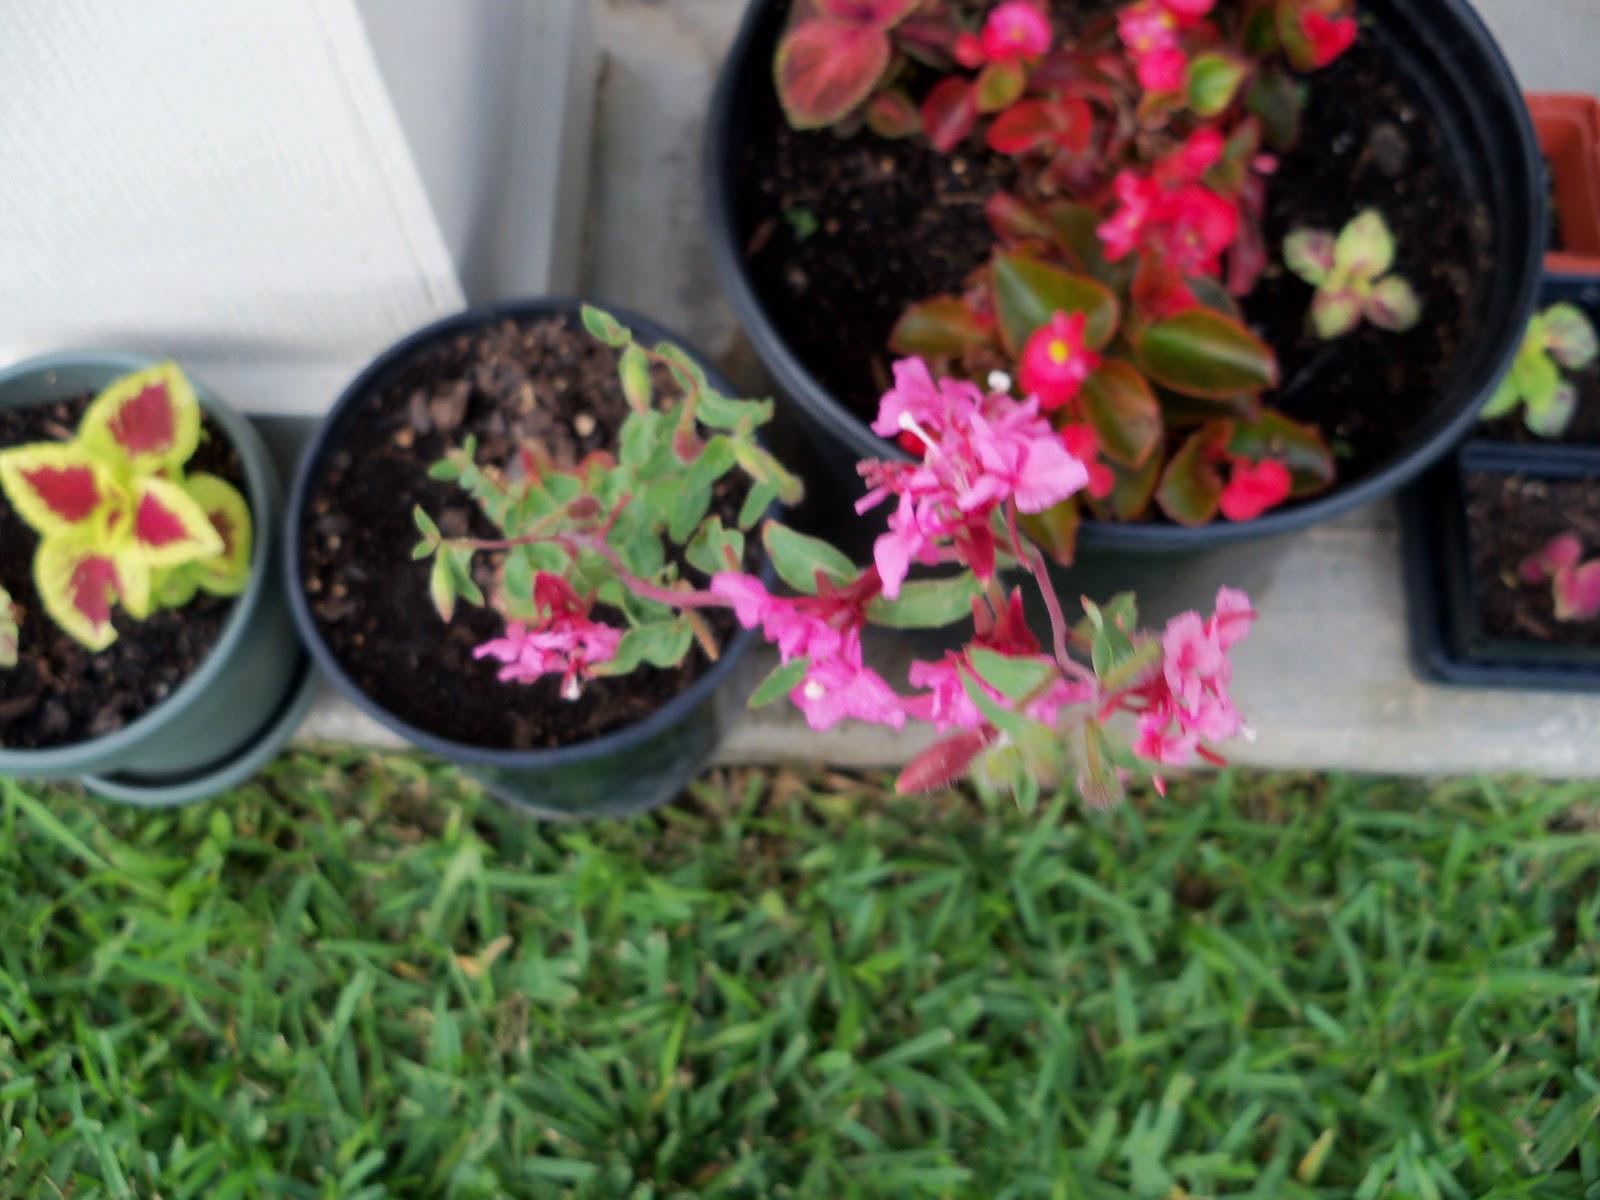 Gardening 2010, Part Two - 101_2778.JPG